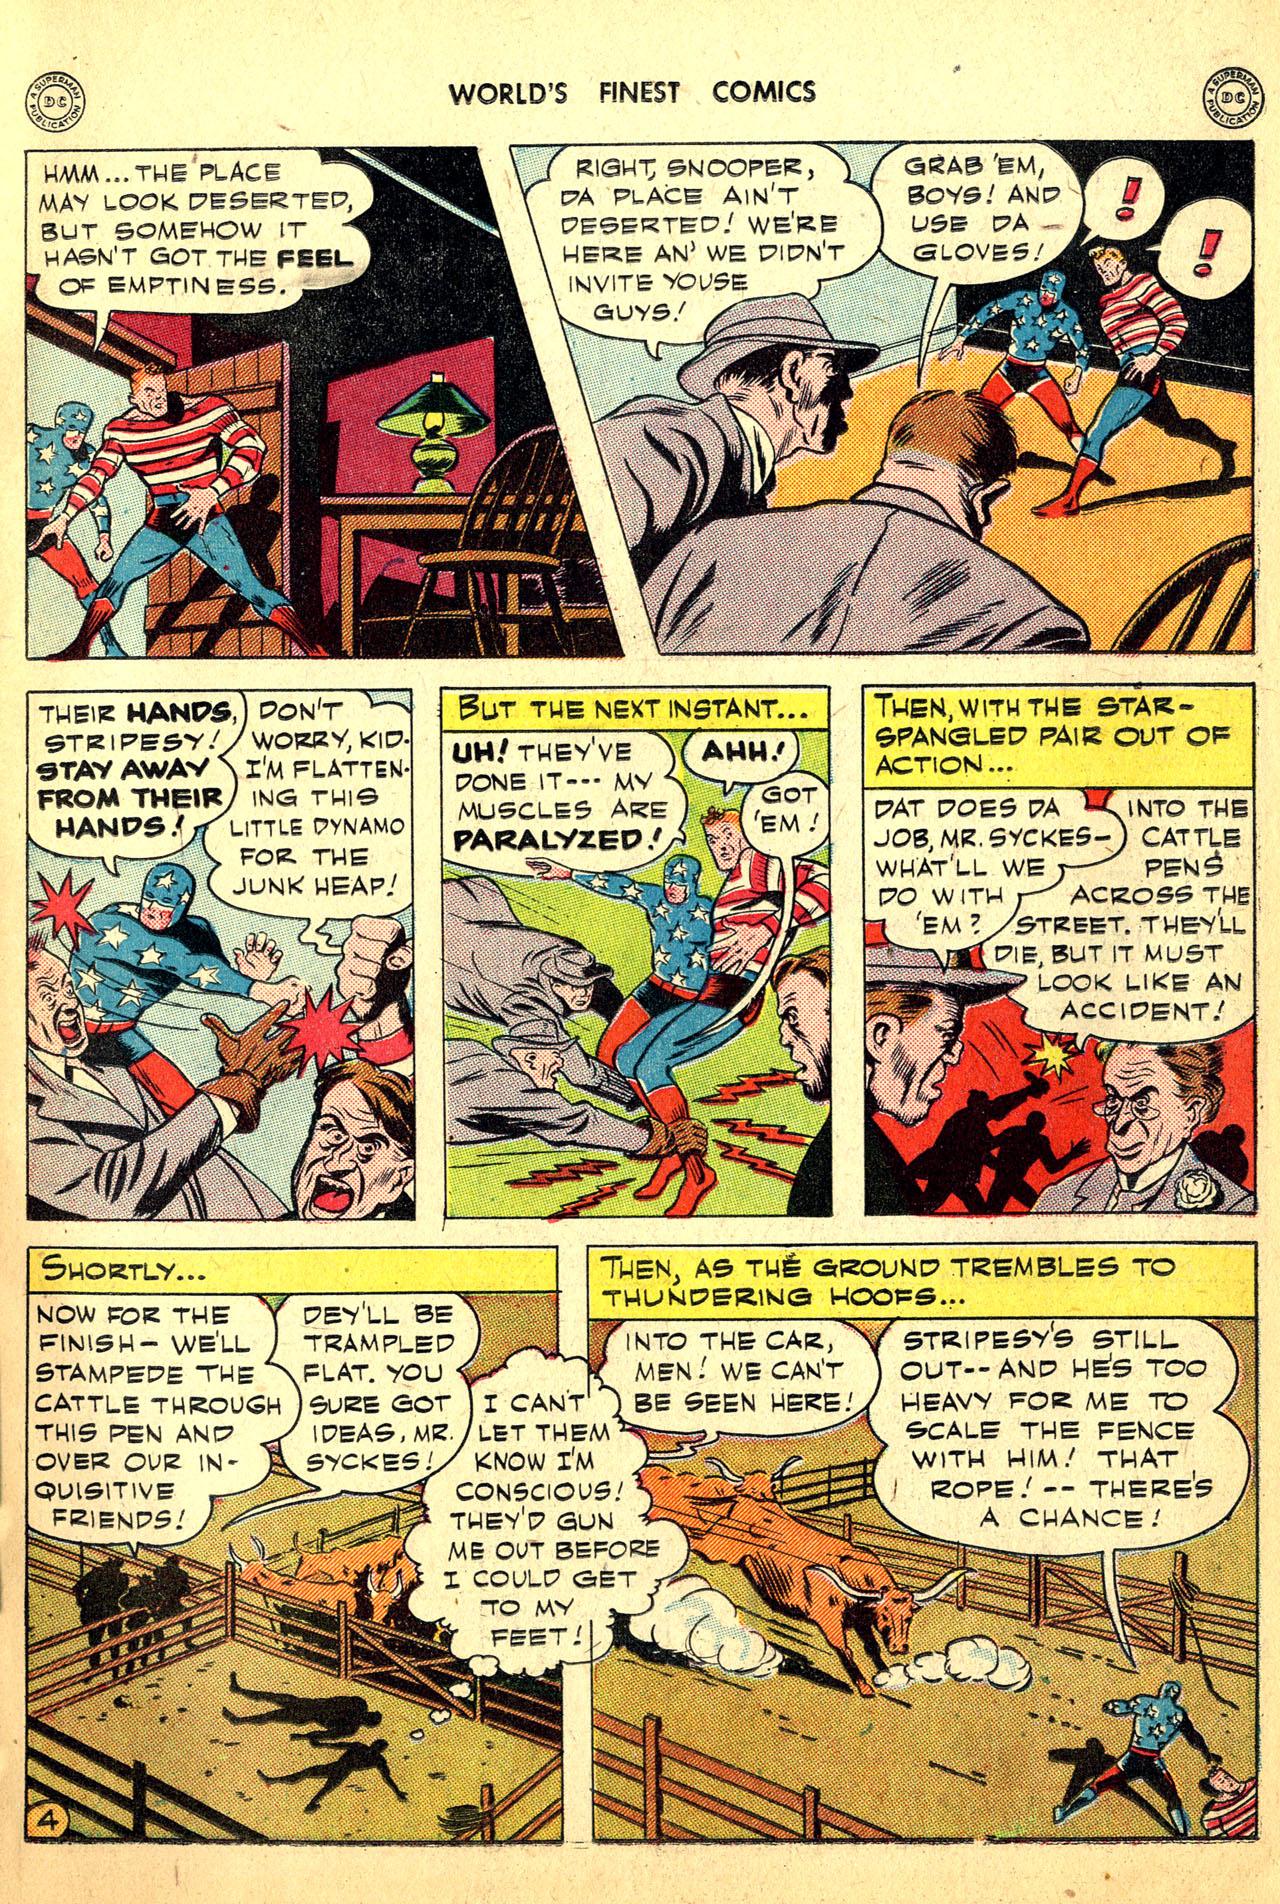 Read online World's Finest Comics comic -  Issue #18 - 19